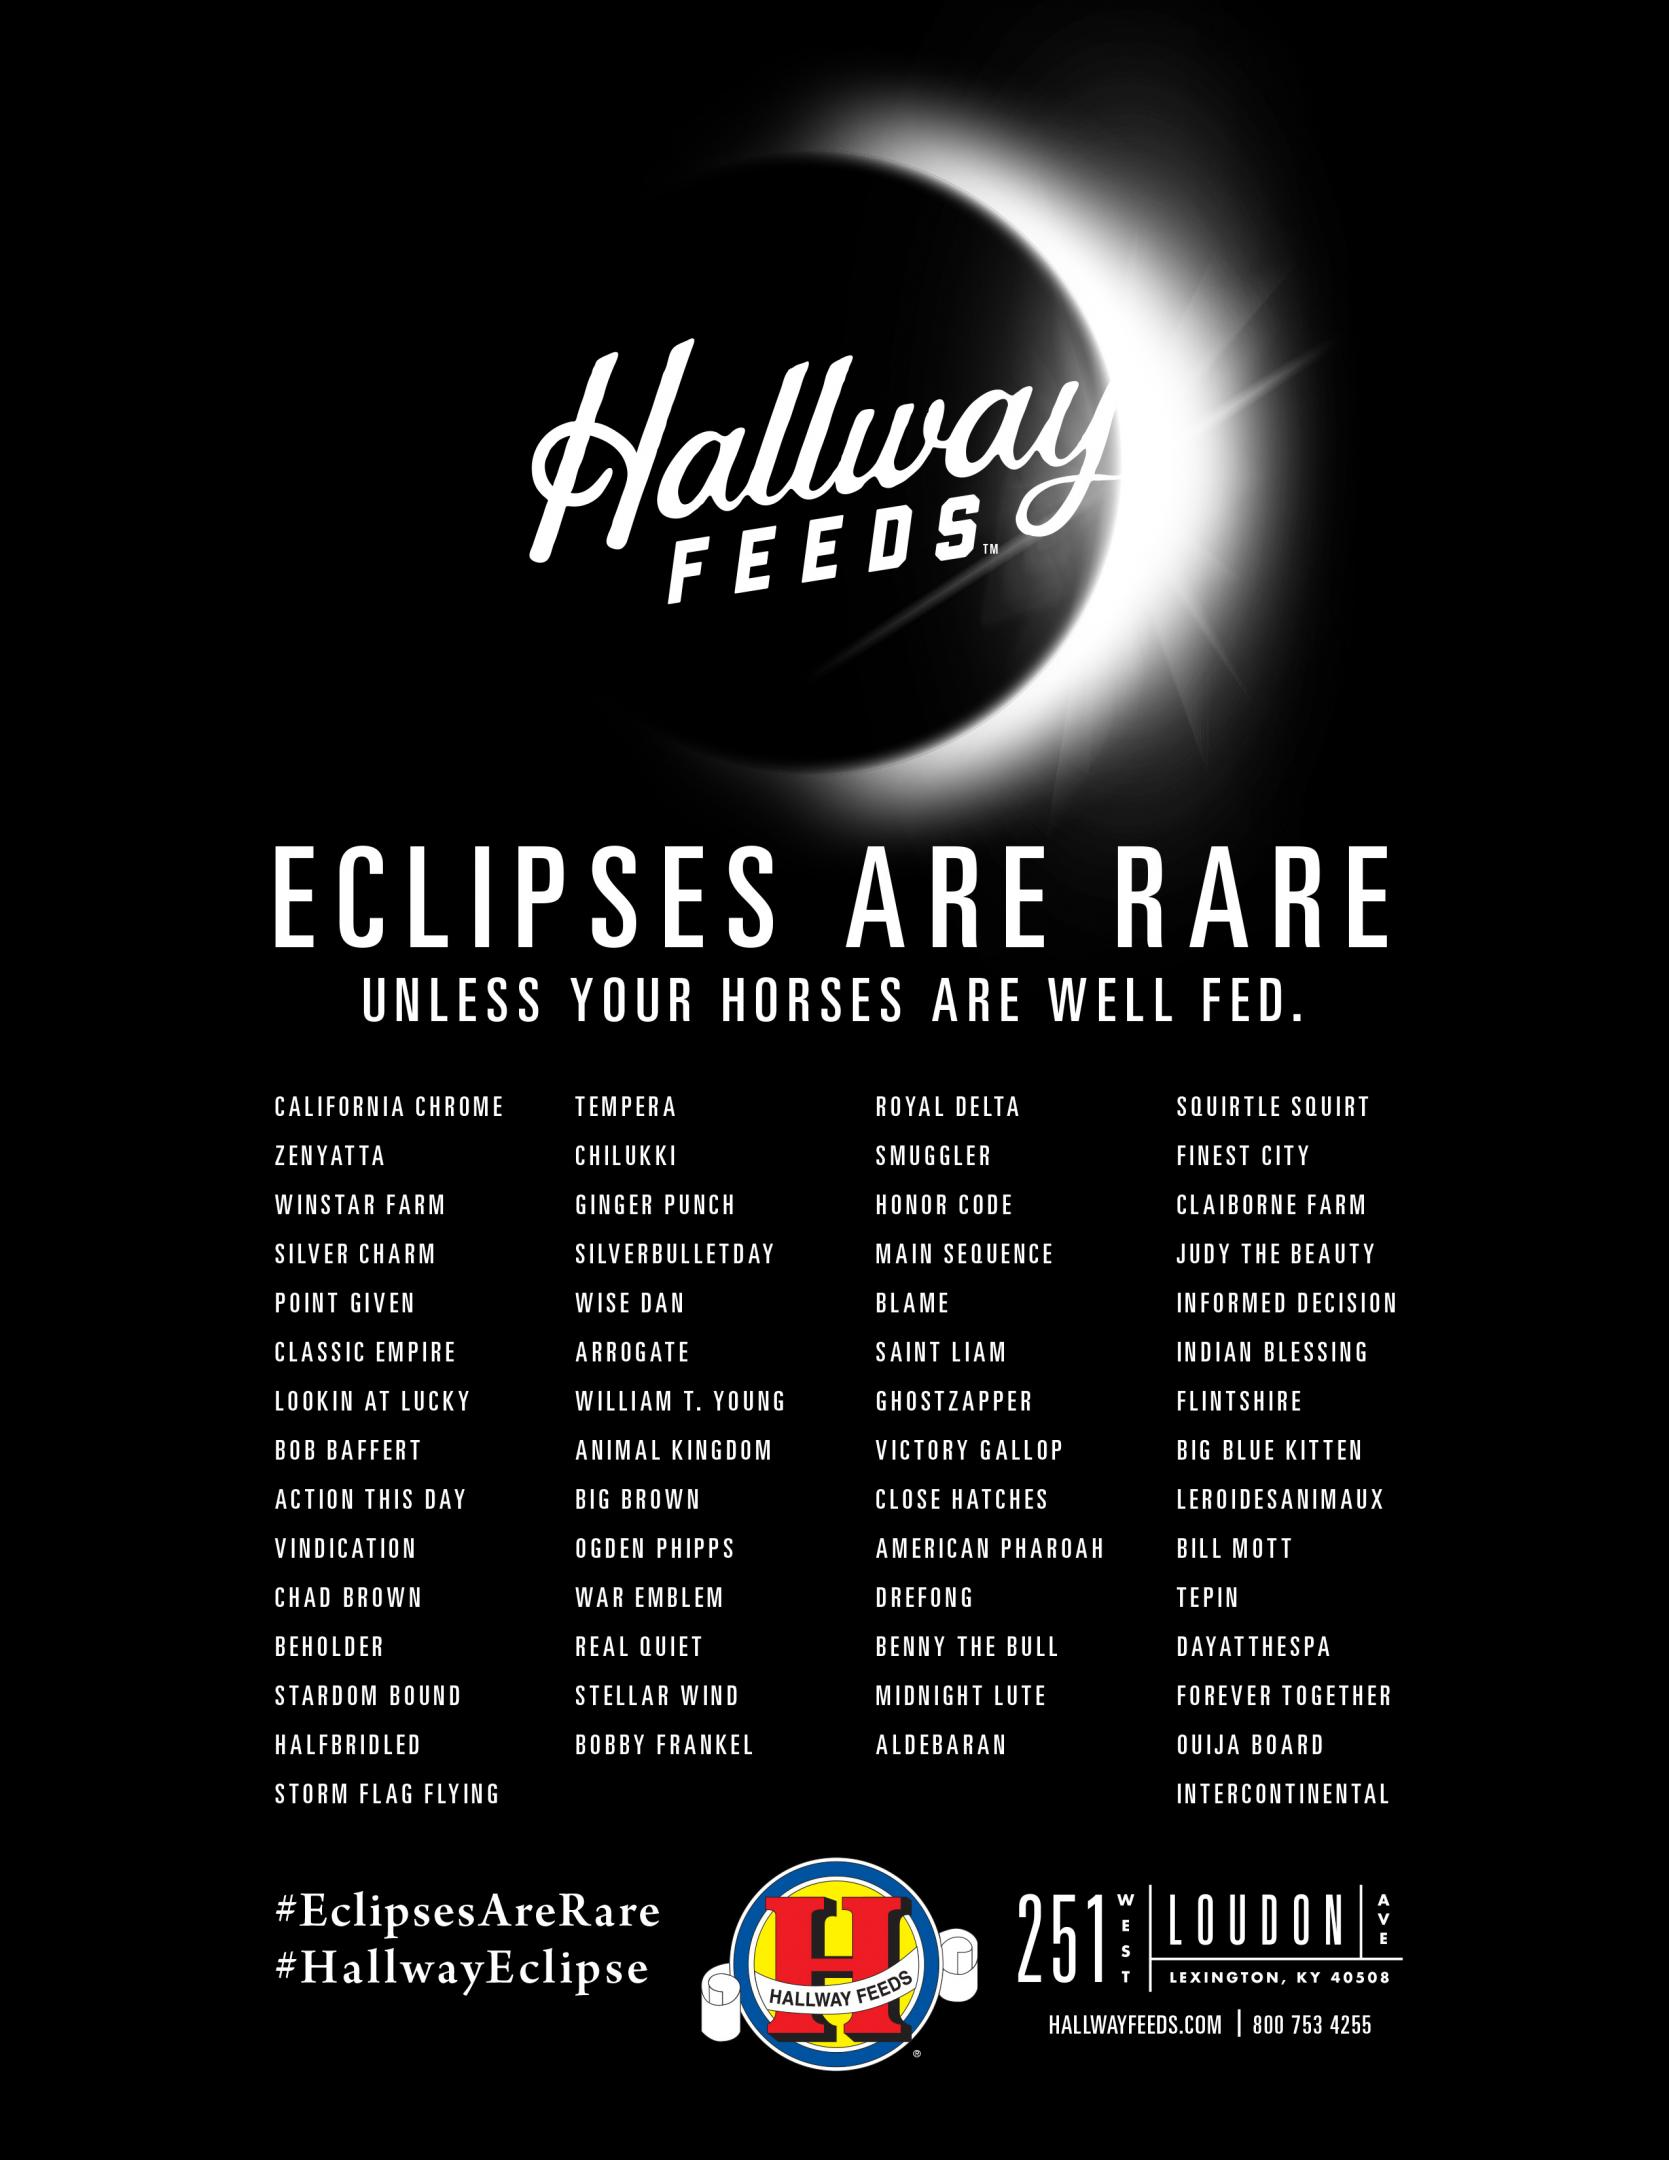 178475-HallwayFeeds-Eclipse-TDN.jpg